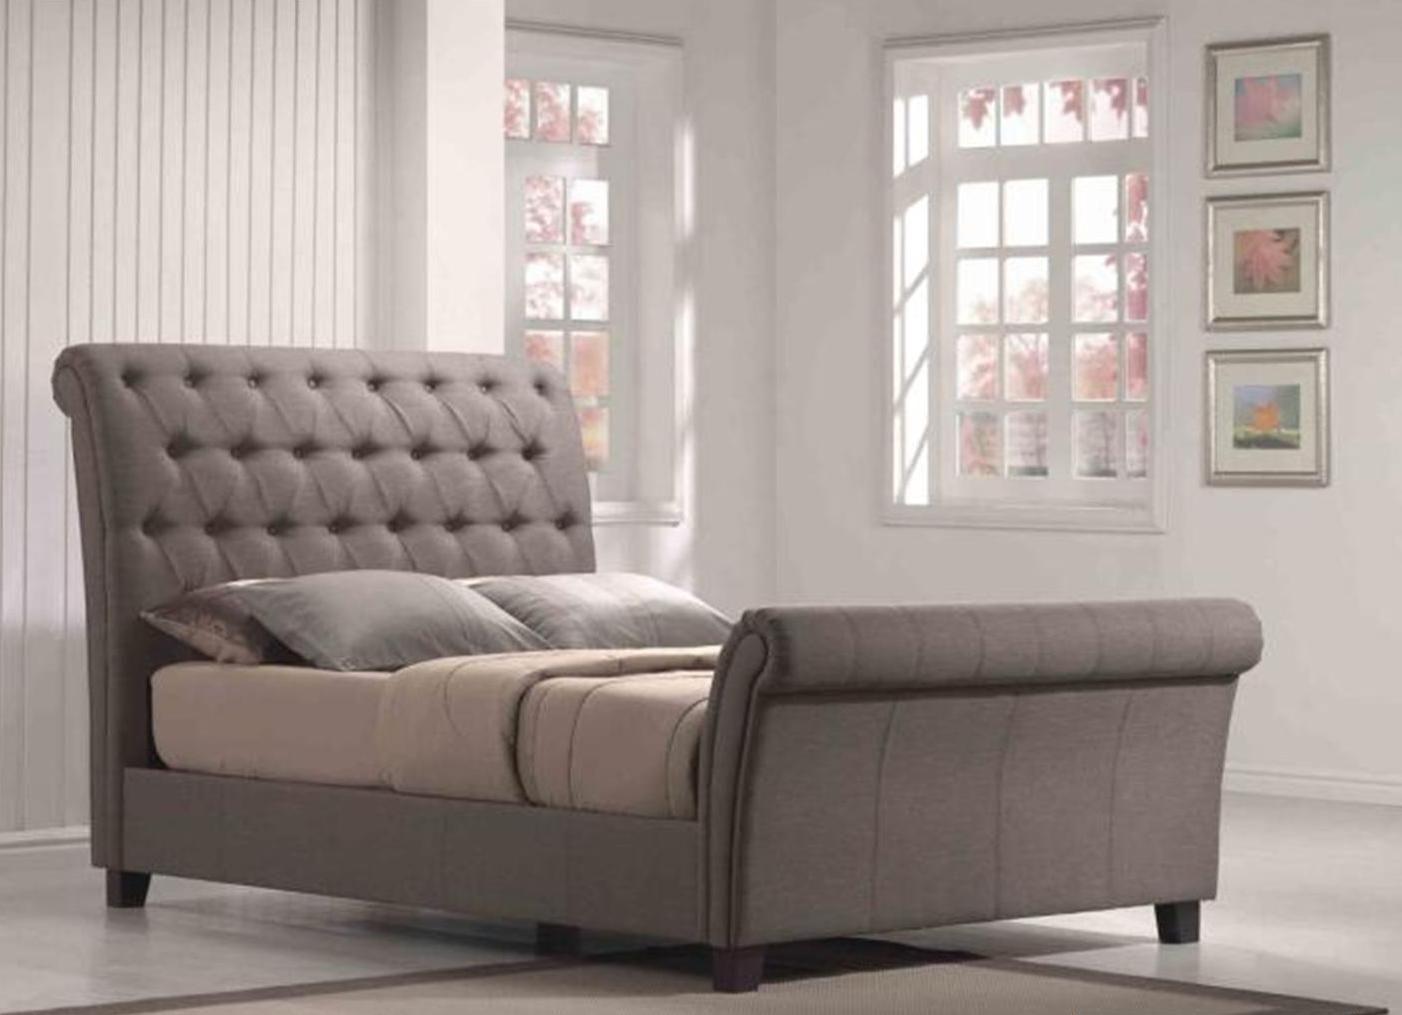 700 King Emerald Home Furnishing Llc Innsbruck Tufted Fabric